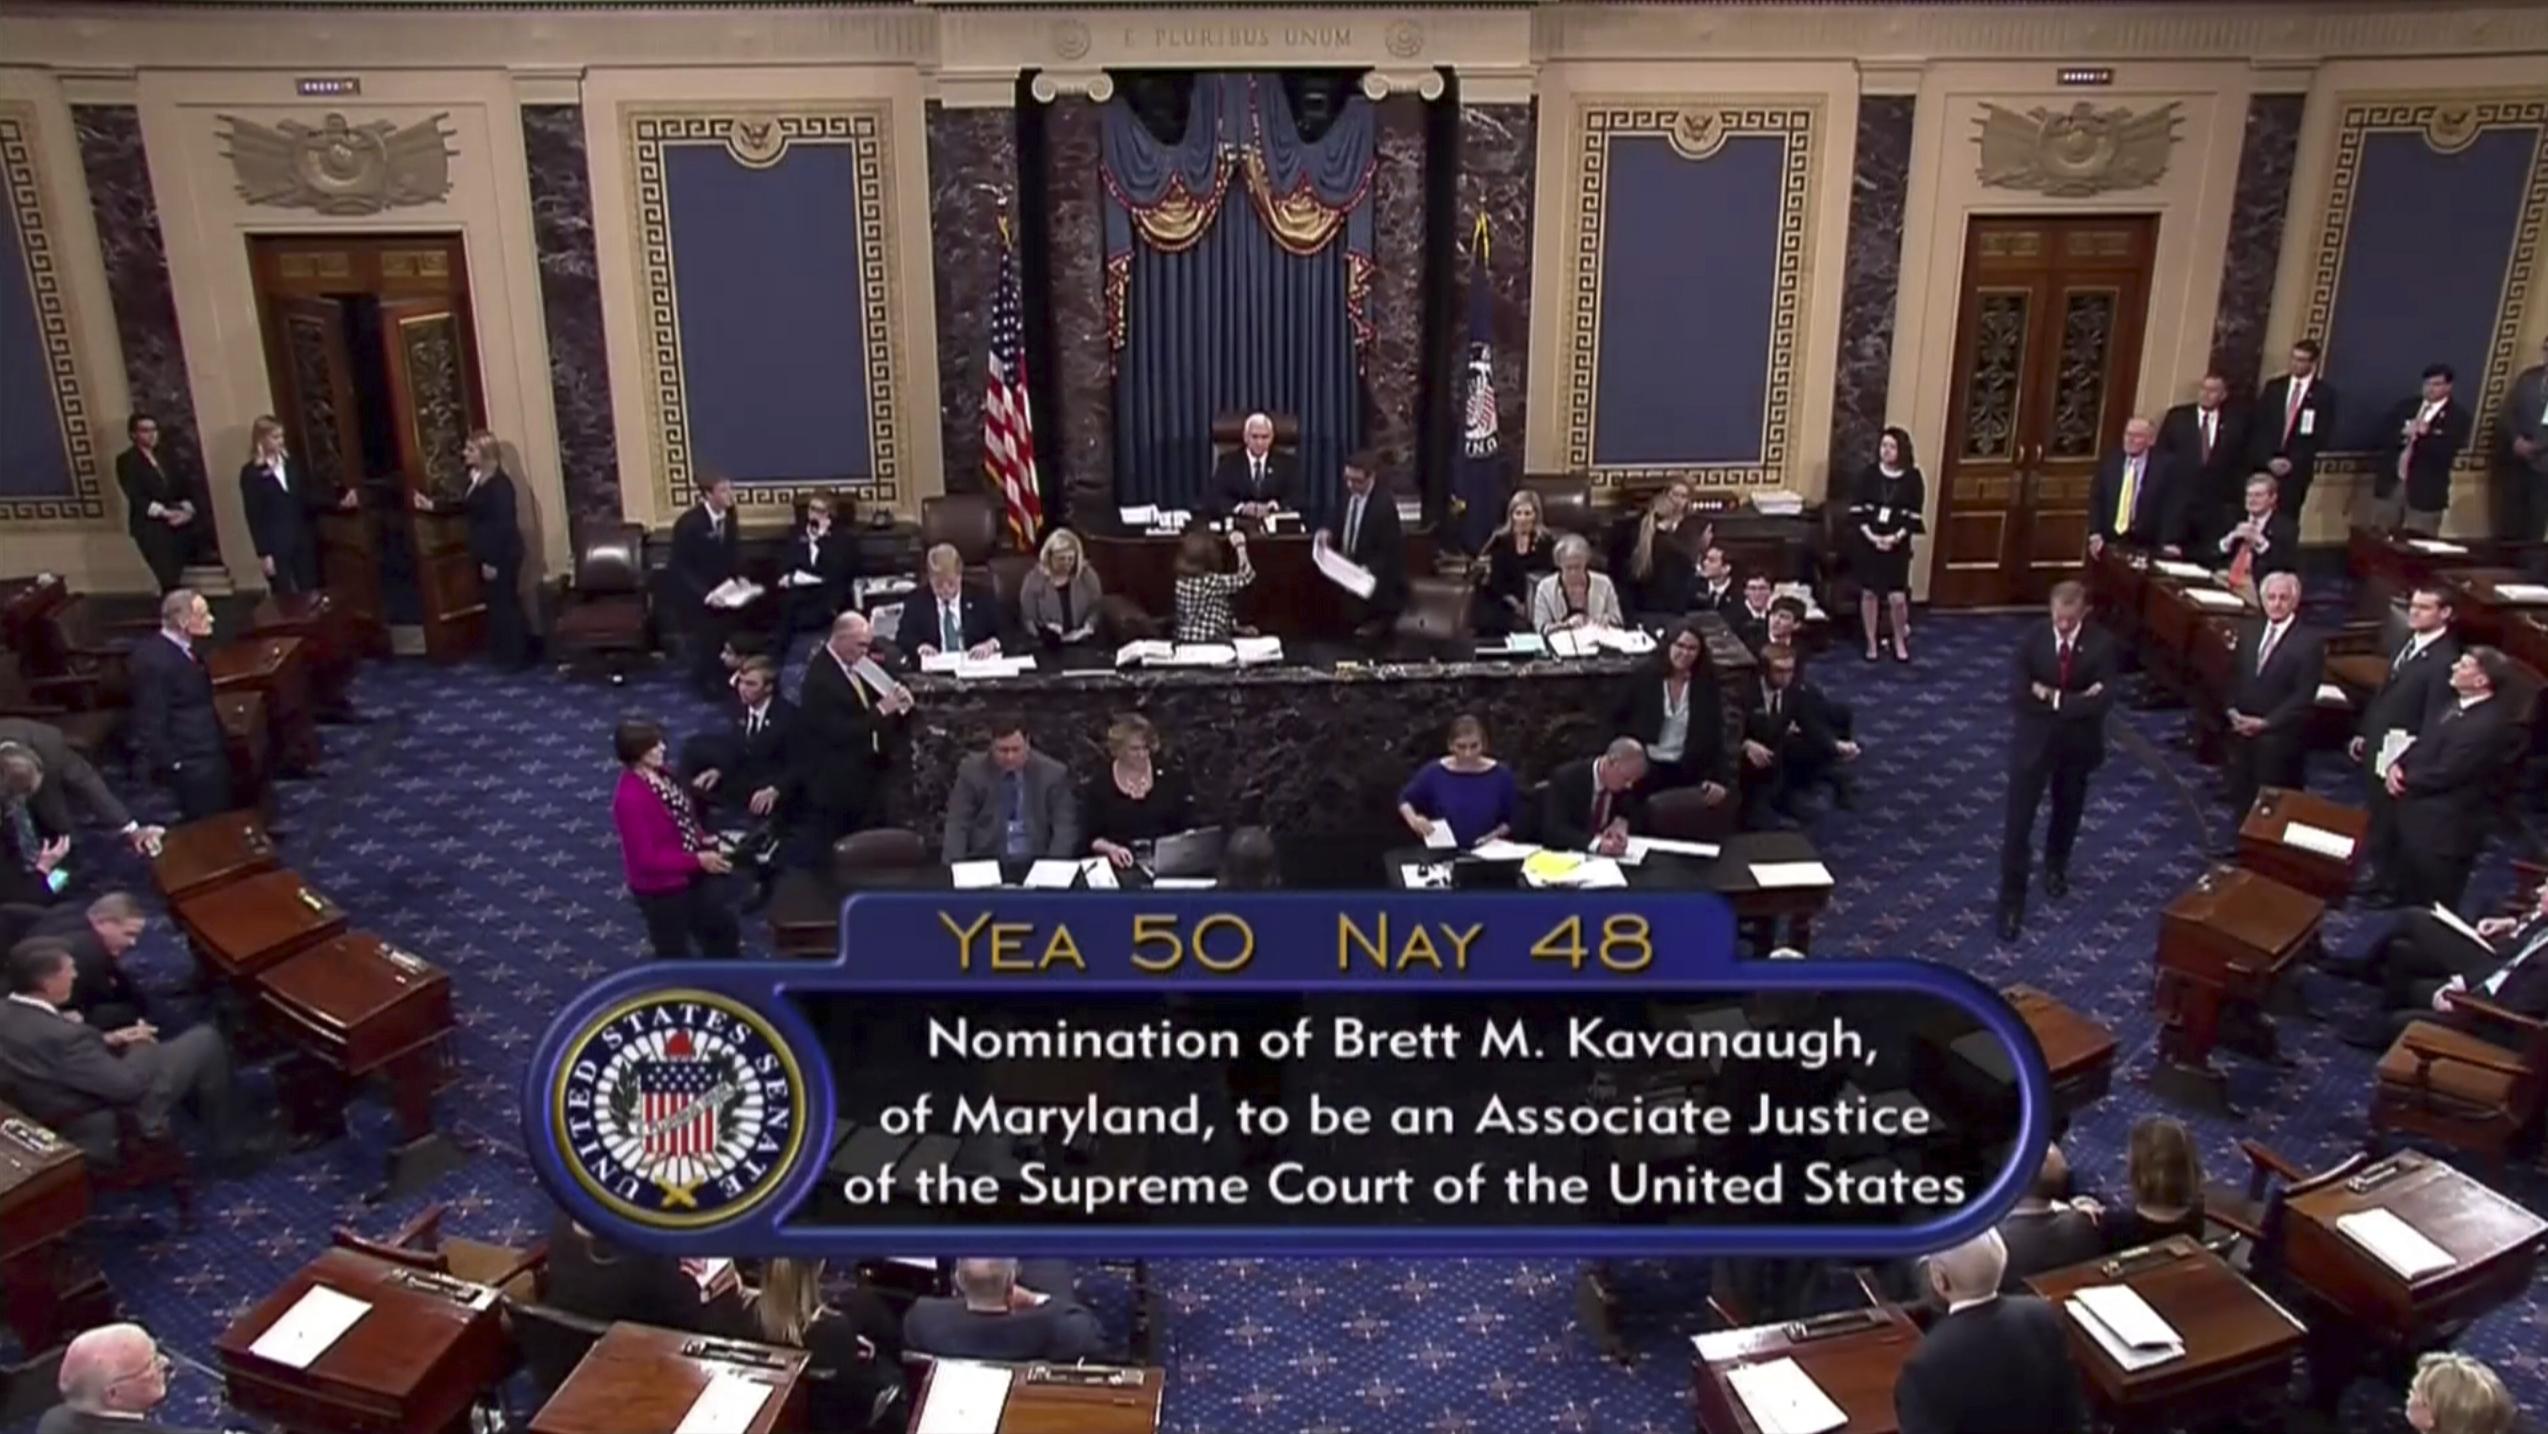 Supreme_Court_Kavanaugh_13628-159532.jpg81546998